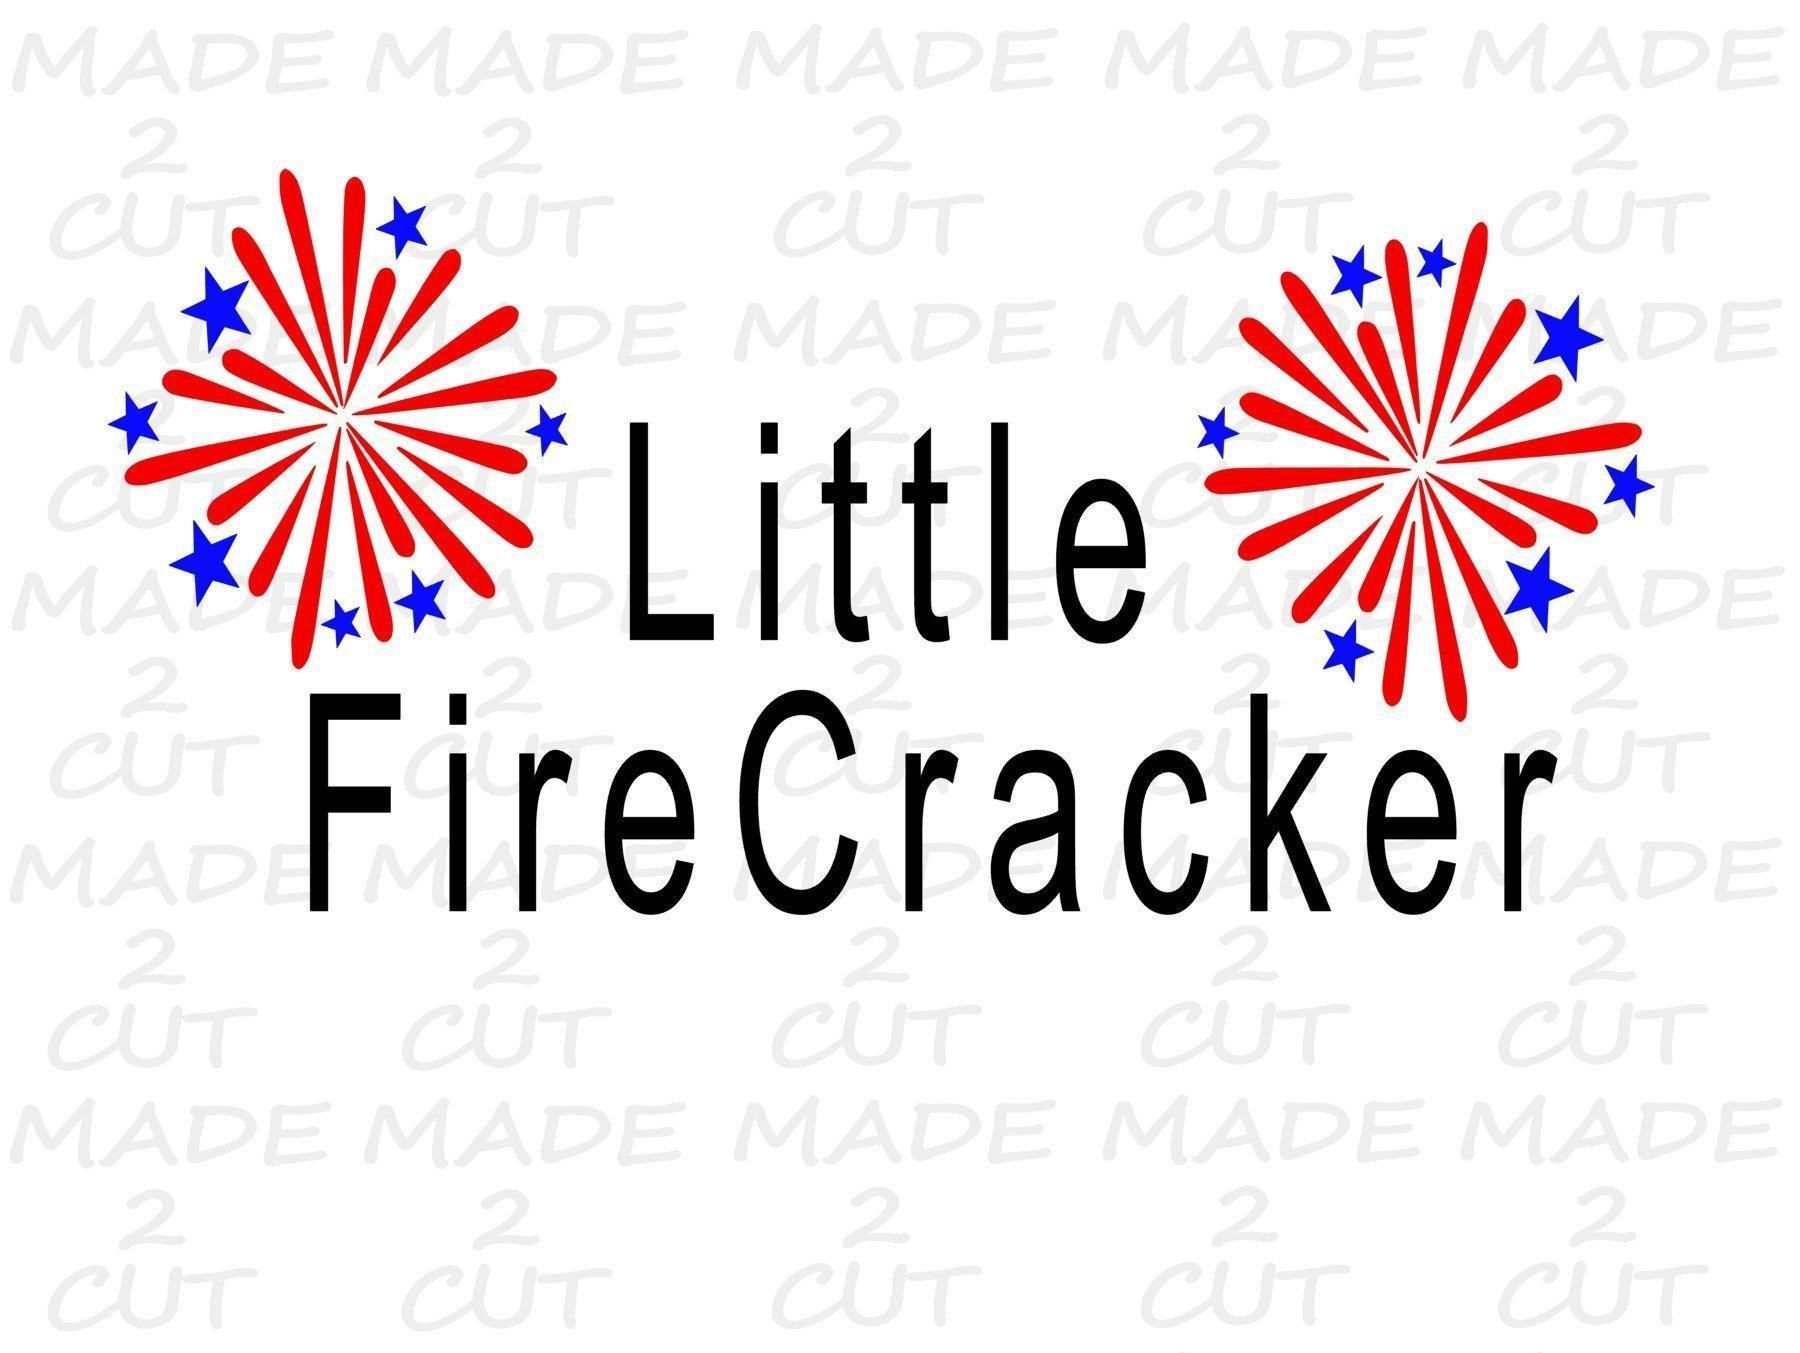 Firework  4th of July Design  Firework Svg  Firework Silhouette Studio Design  F... -  Firework  4th of July Design  Firework Svg  Firework Silhouette Studio Design  Fourth of July Desig - #4th #4thofjulyart #4thofjulybanner #4thofjulycrafts #4thofjulydecorations #4thofjulydesserts #4thofjulyfireworks #4thofjulyfood #4thofjulyfoodappetizers #4thofjulyfooddessert #4thofjulynails #4thofjulyoutfitforwomen #4thofjulypartyideas #4thofjulypictures #4thofjulyquotes #design #firework #happy4thofjuly #J